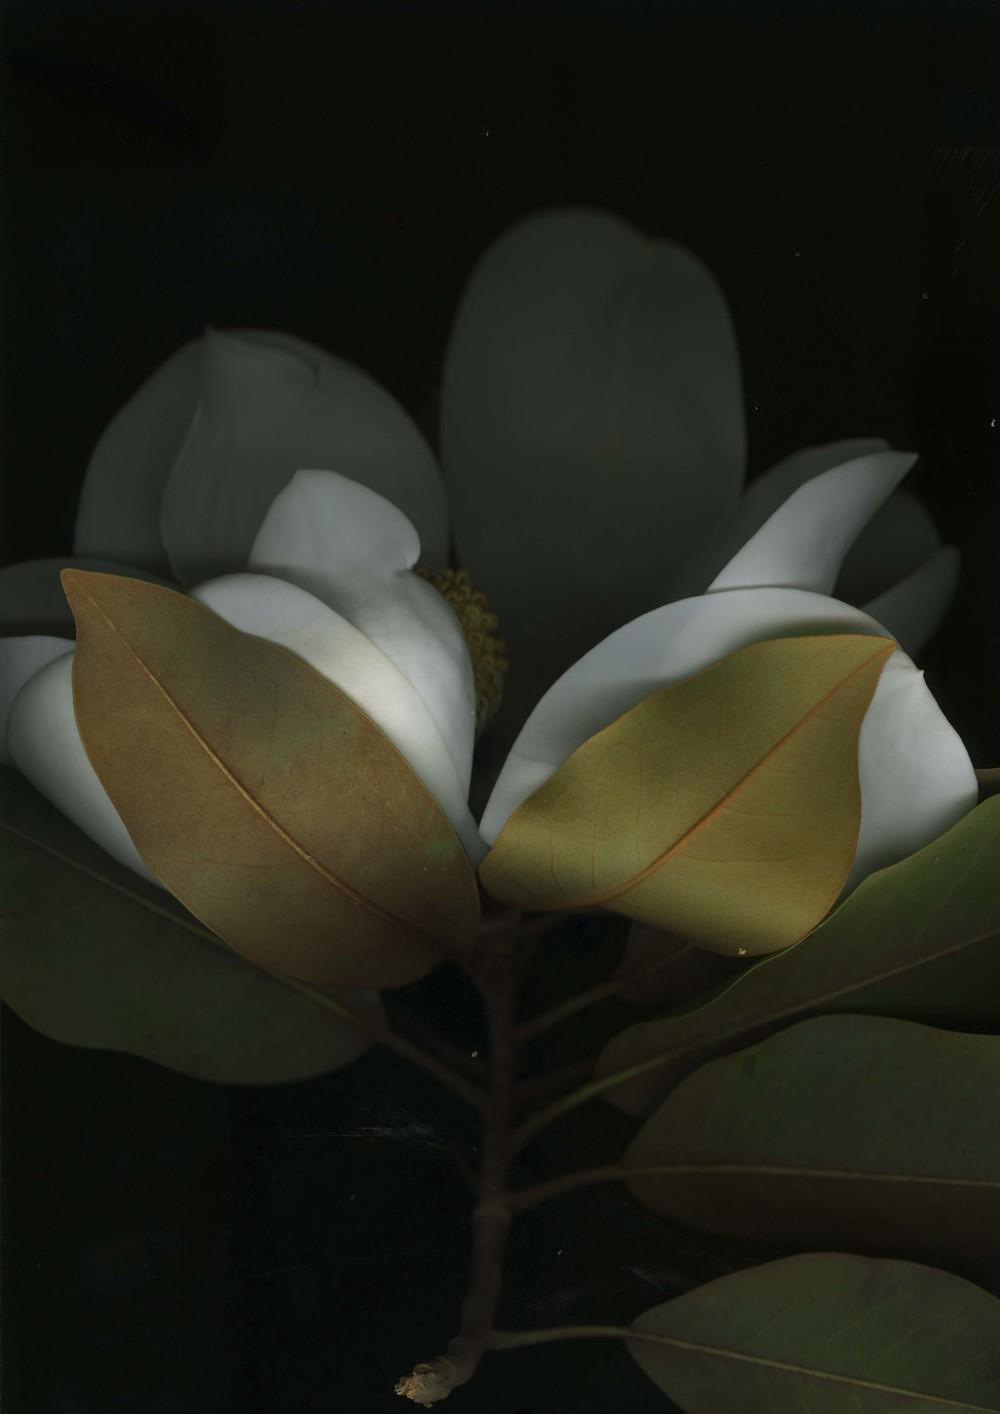 magnolia_6.jpg